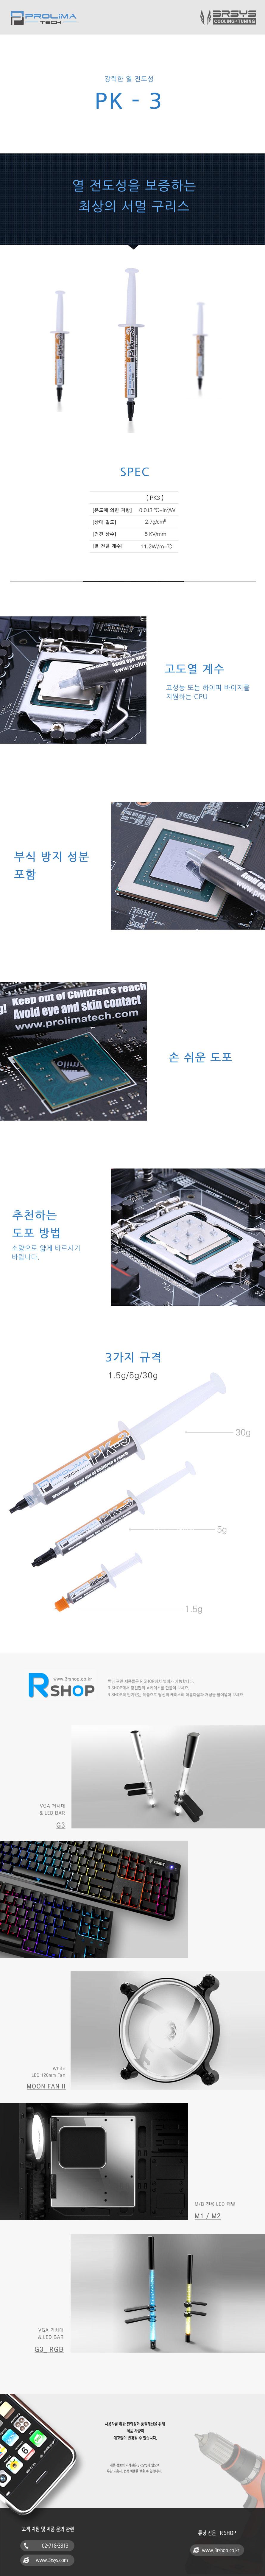 PROLIMATECH  PK-3 new Nano Aluminum 3R(30g)